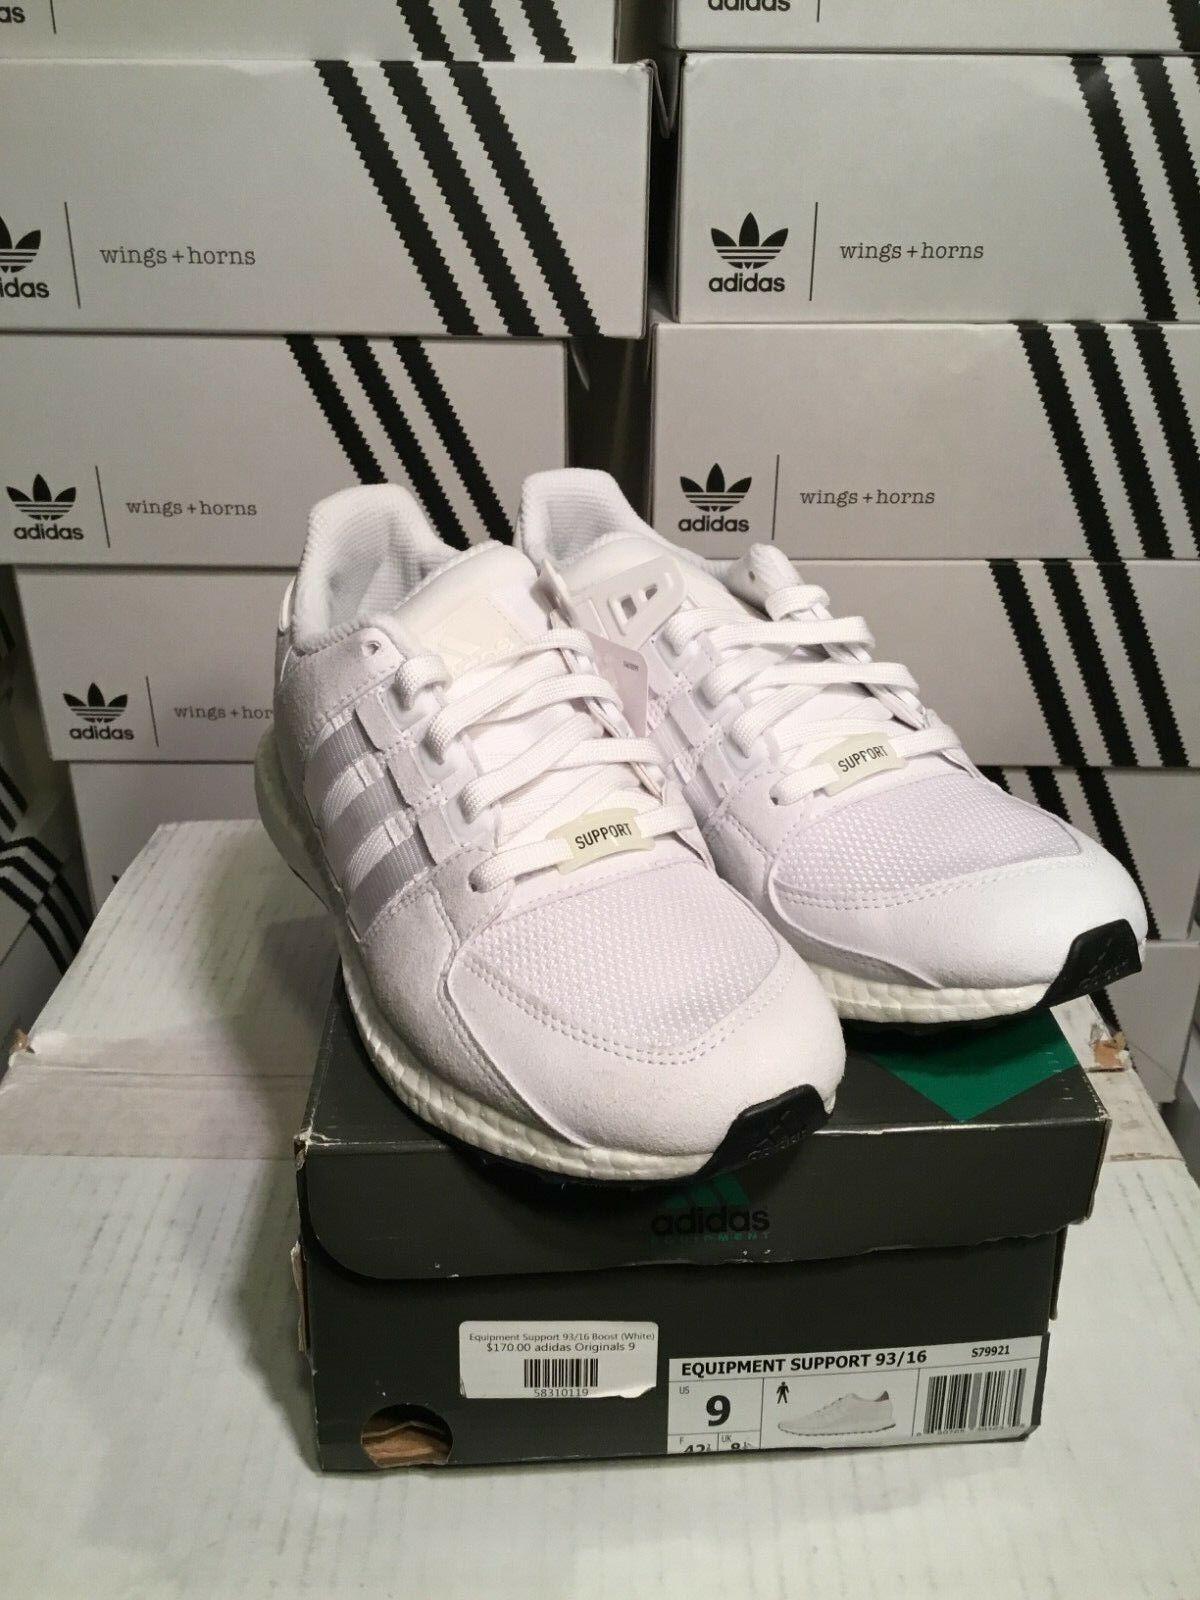 SALE adidas EQT Equipment Support 93 16 White S79921 Size 9 & 10 Brand New